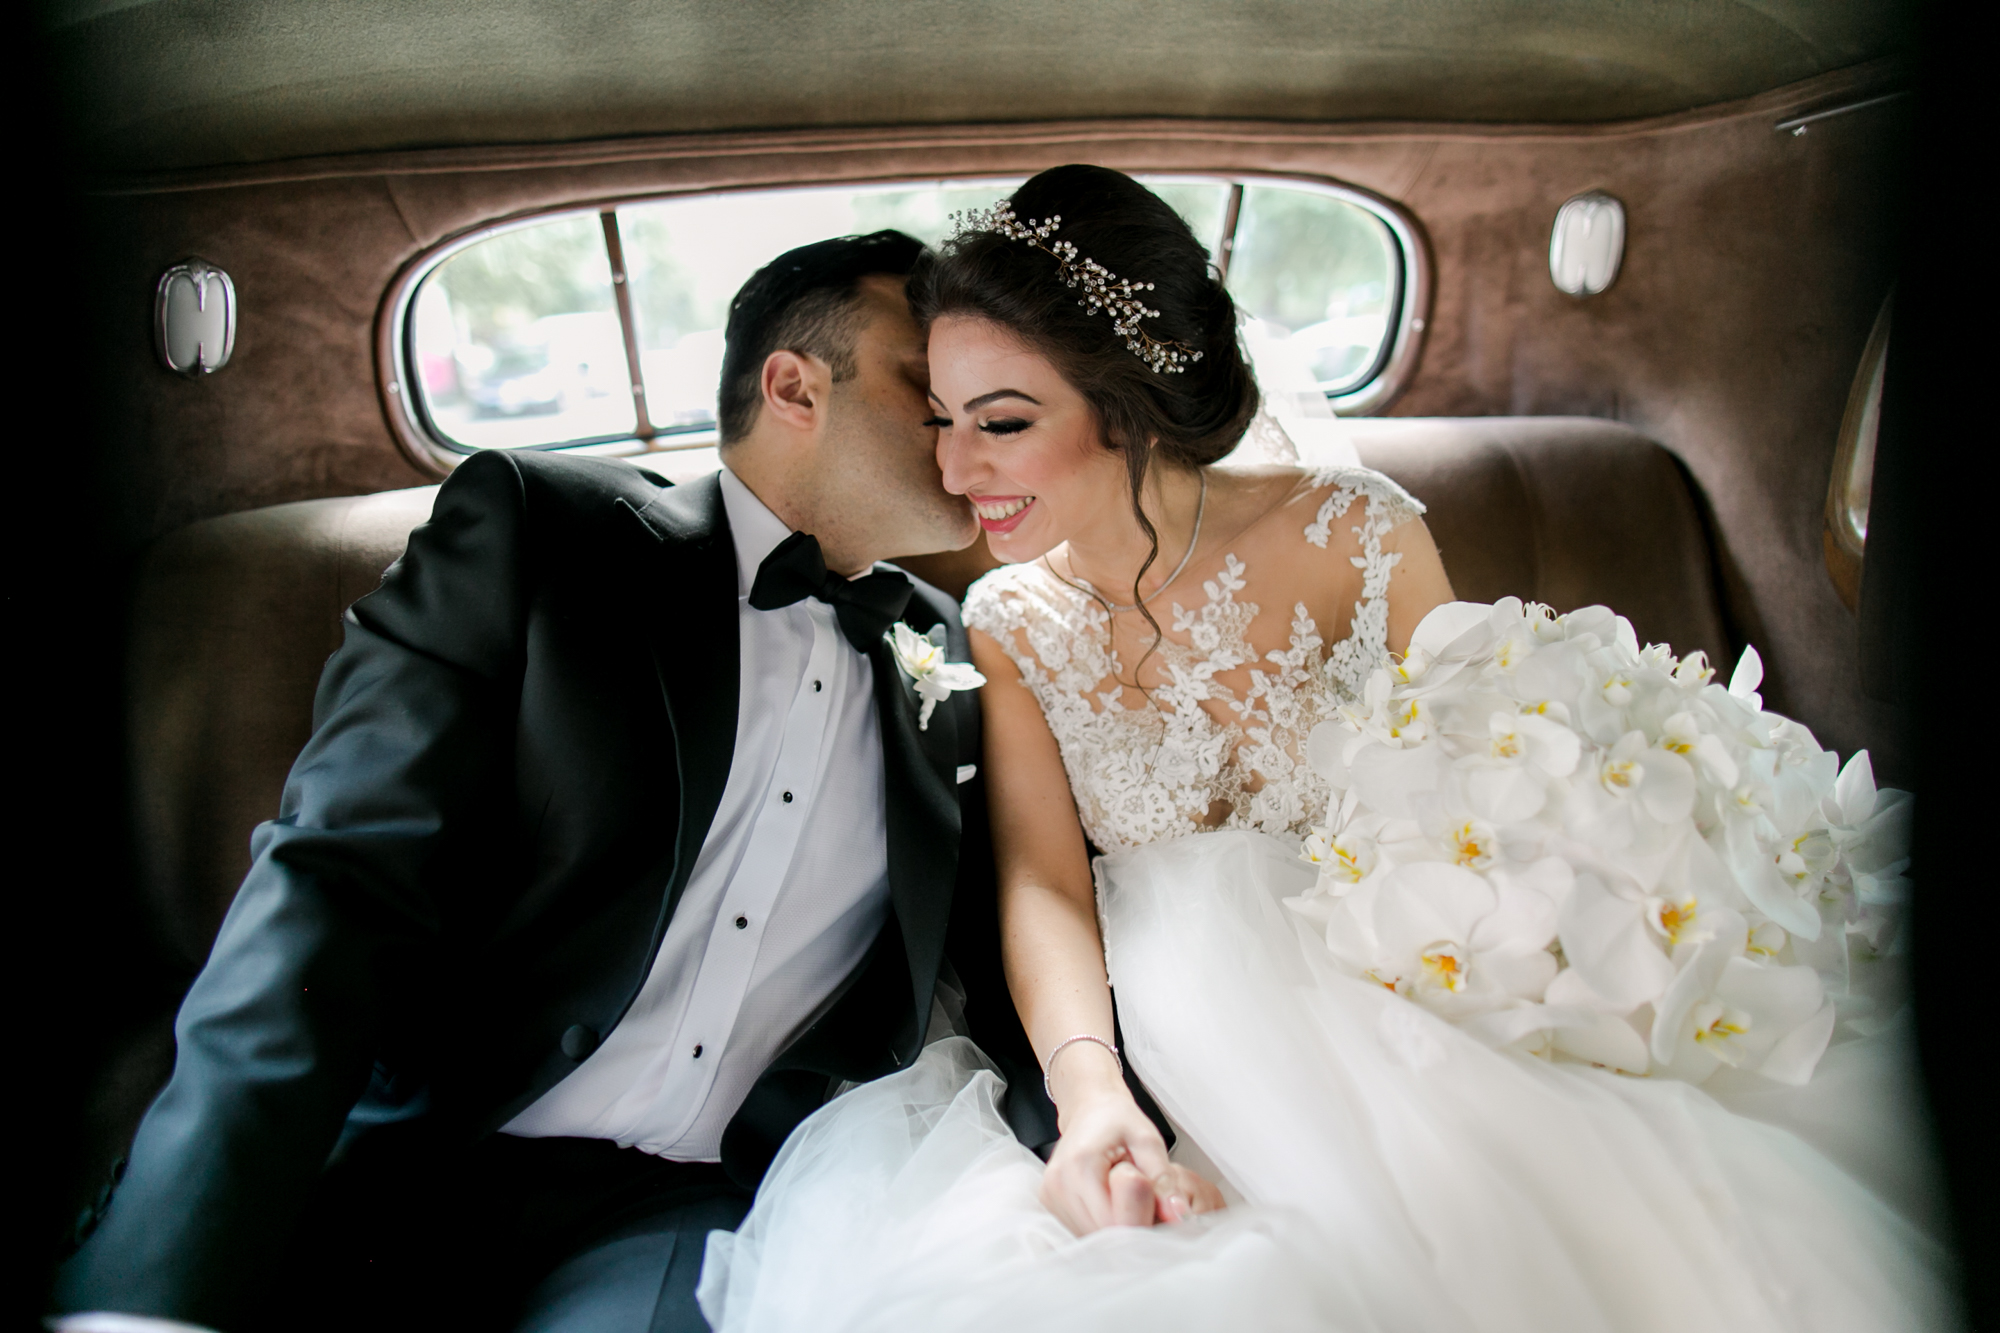 vancouver-luxury-wedding-photographer-lori-miles--2.jpg